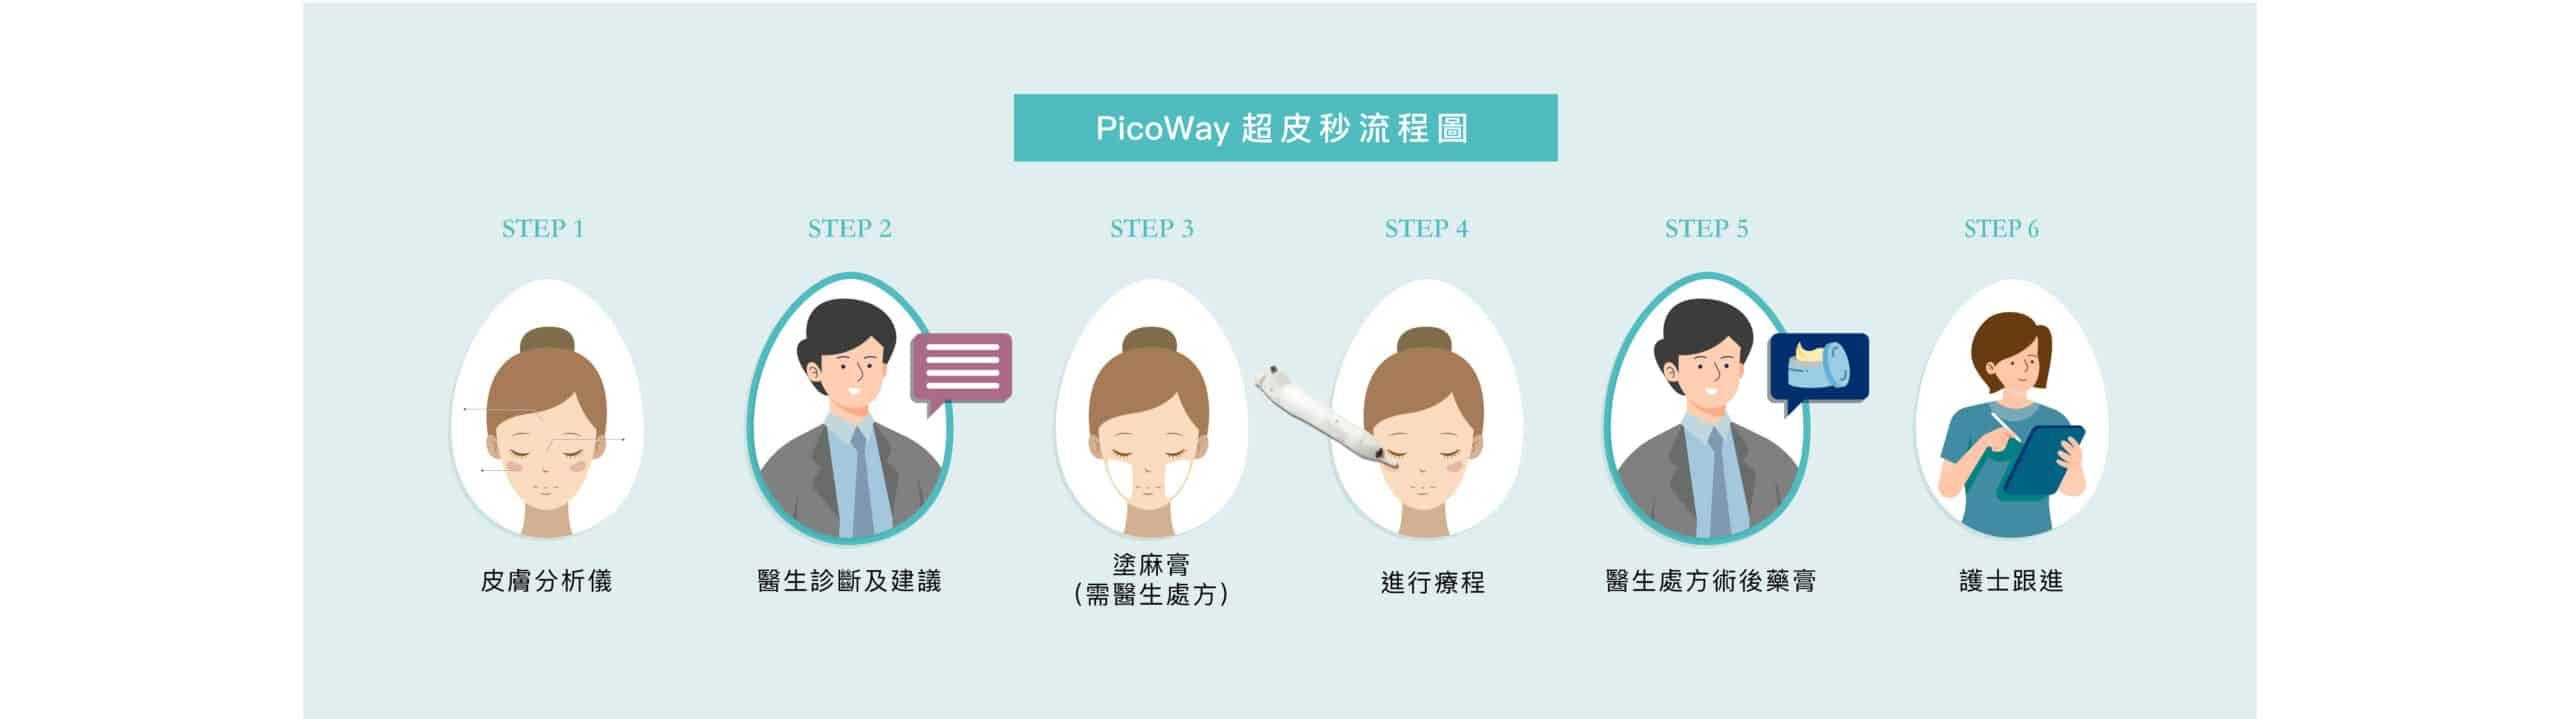 picoway_n02 pico new version 0917 04 04 scaled